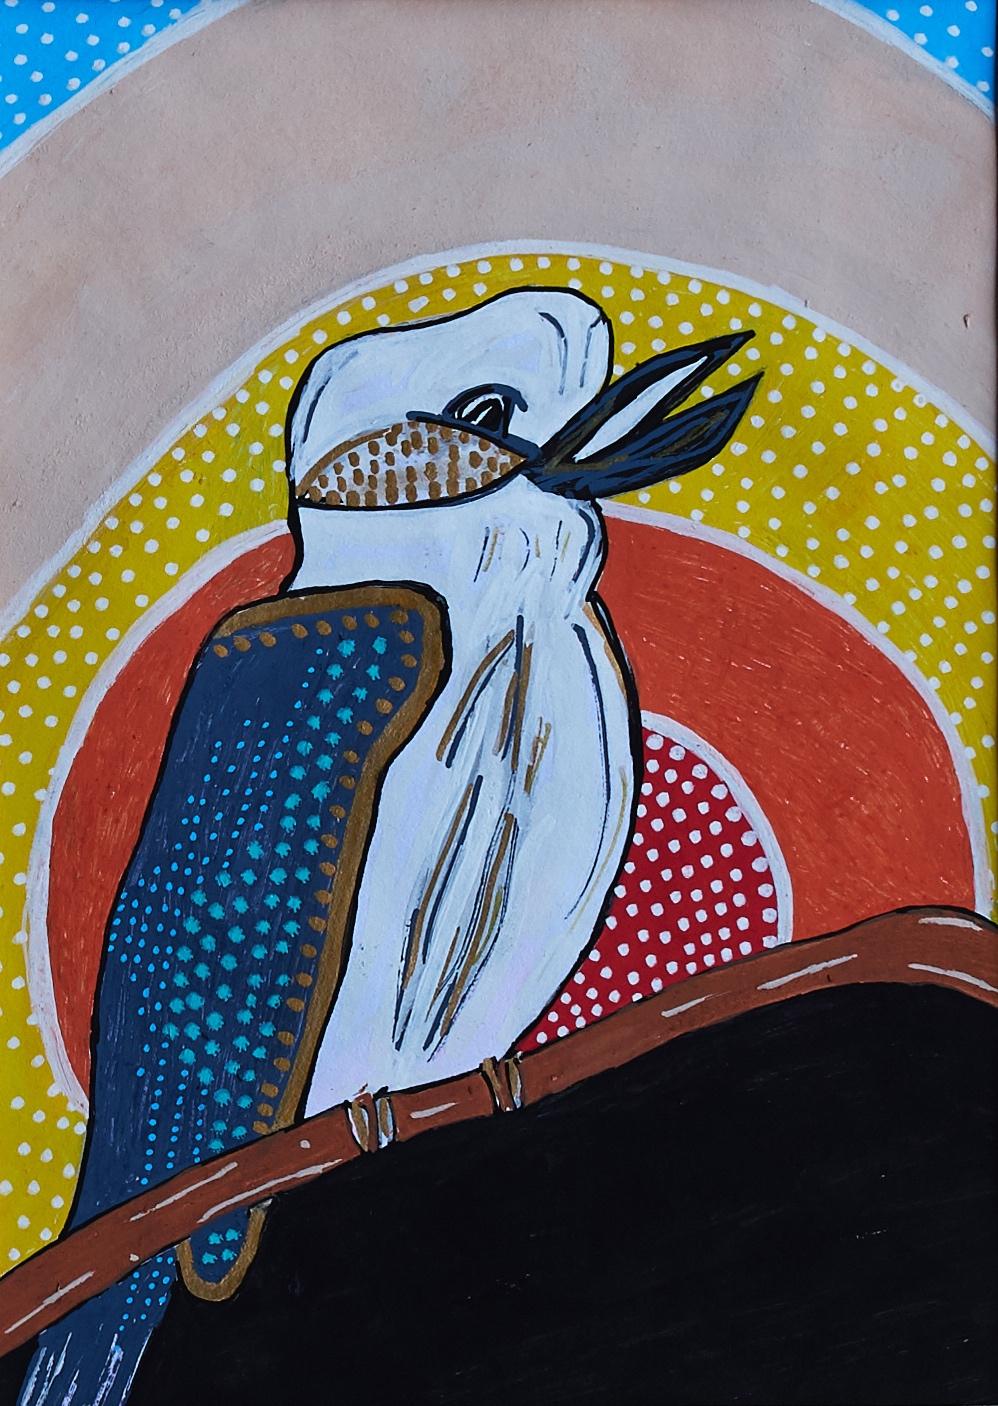 K.k.k.k.K…KATIE had a matey - work on paper; acrylic paint pens14.8cm x 21cm2017